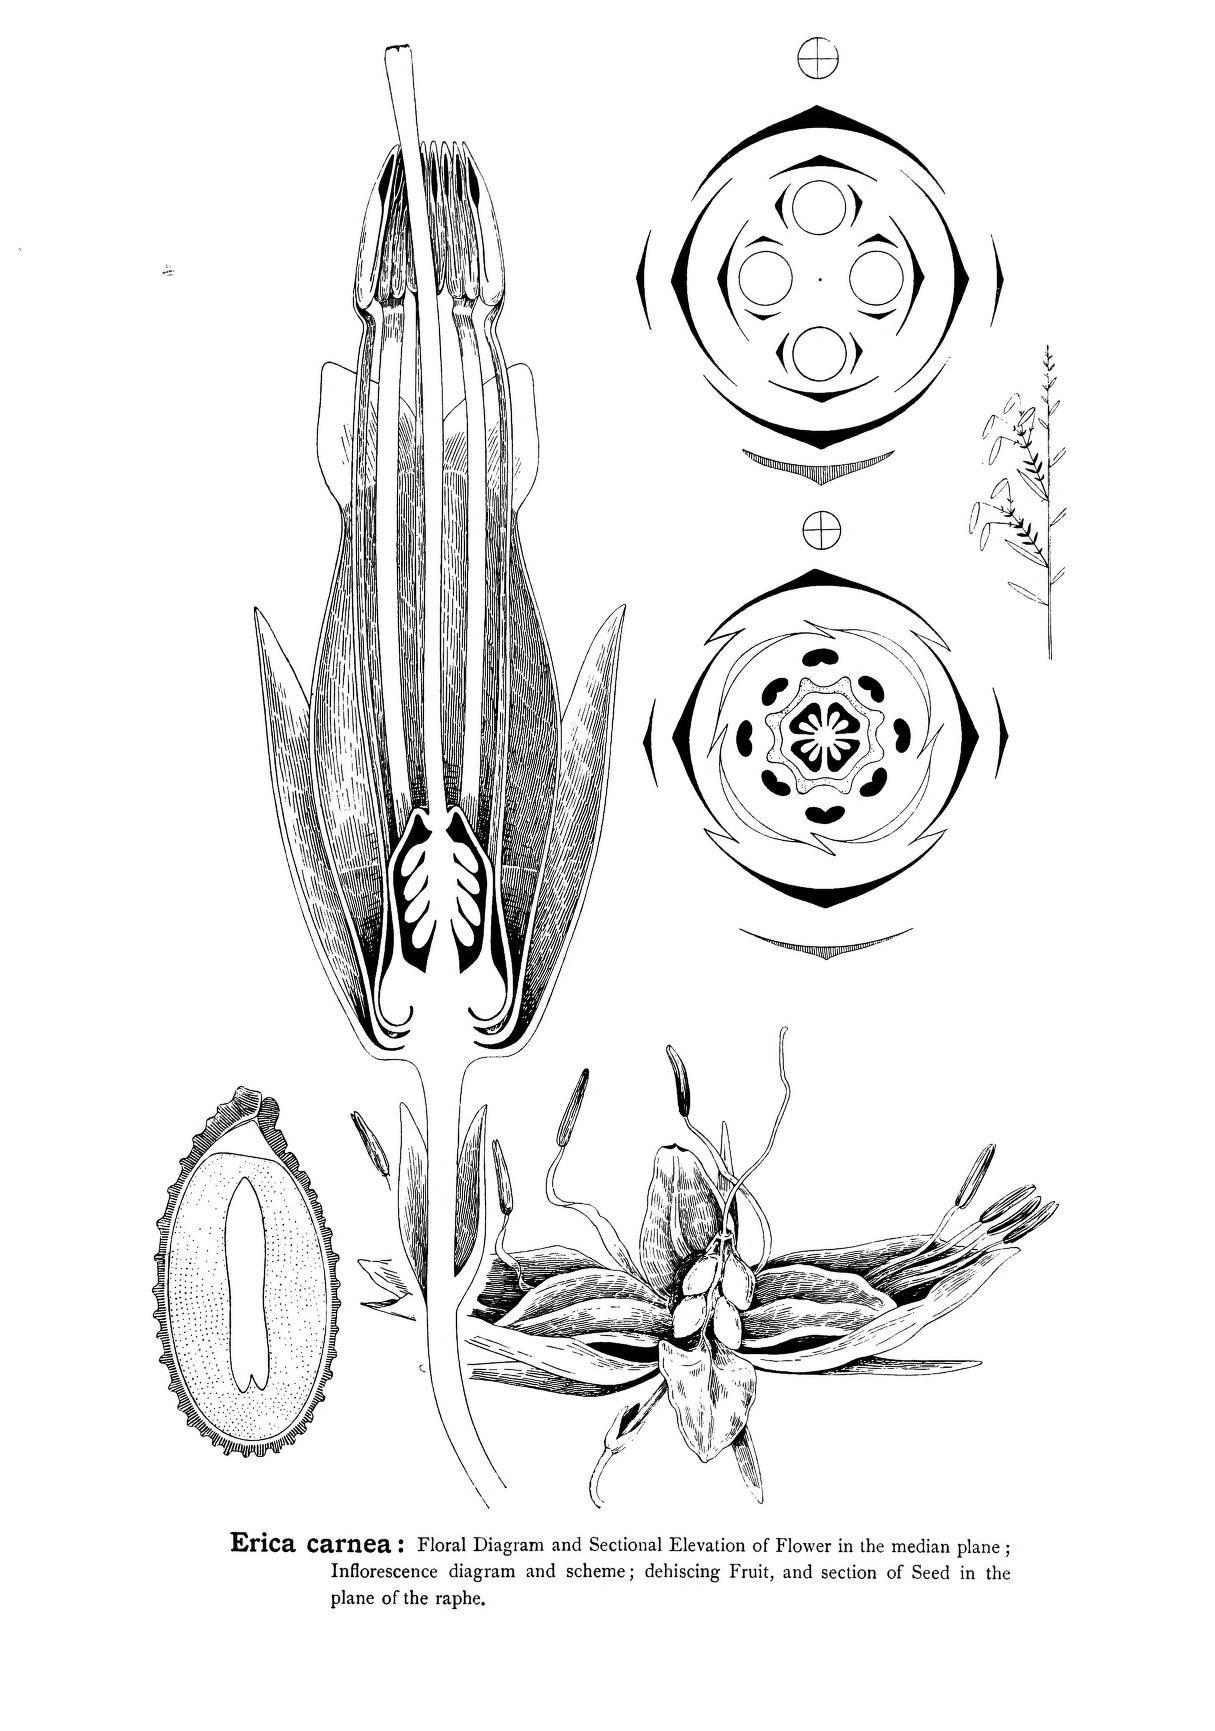 P 217 | Arthur Harry Church | Types of floral mechanism; a